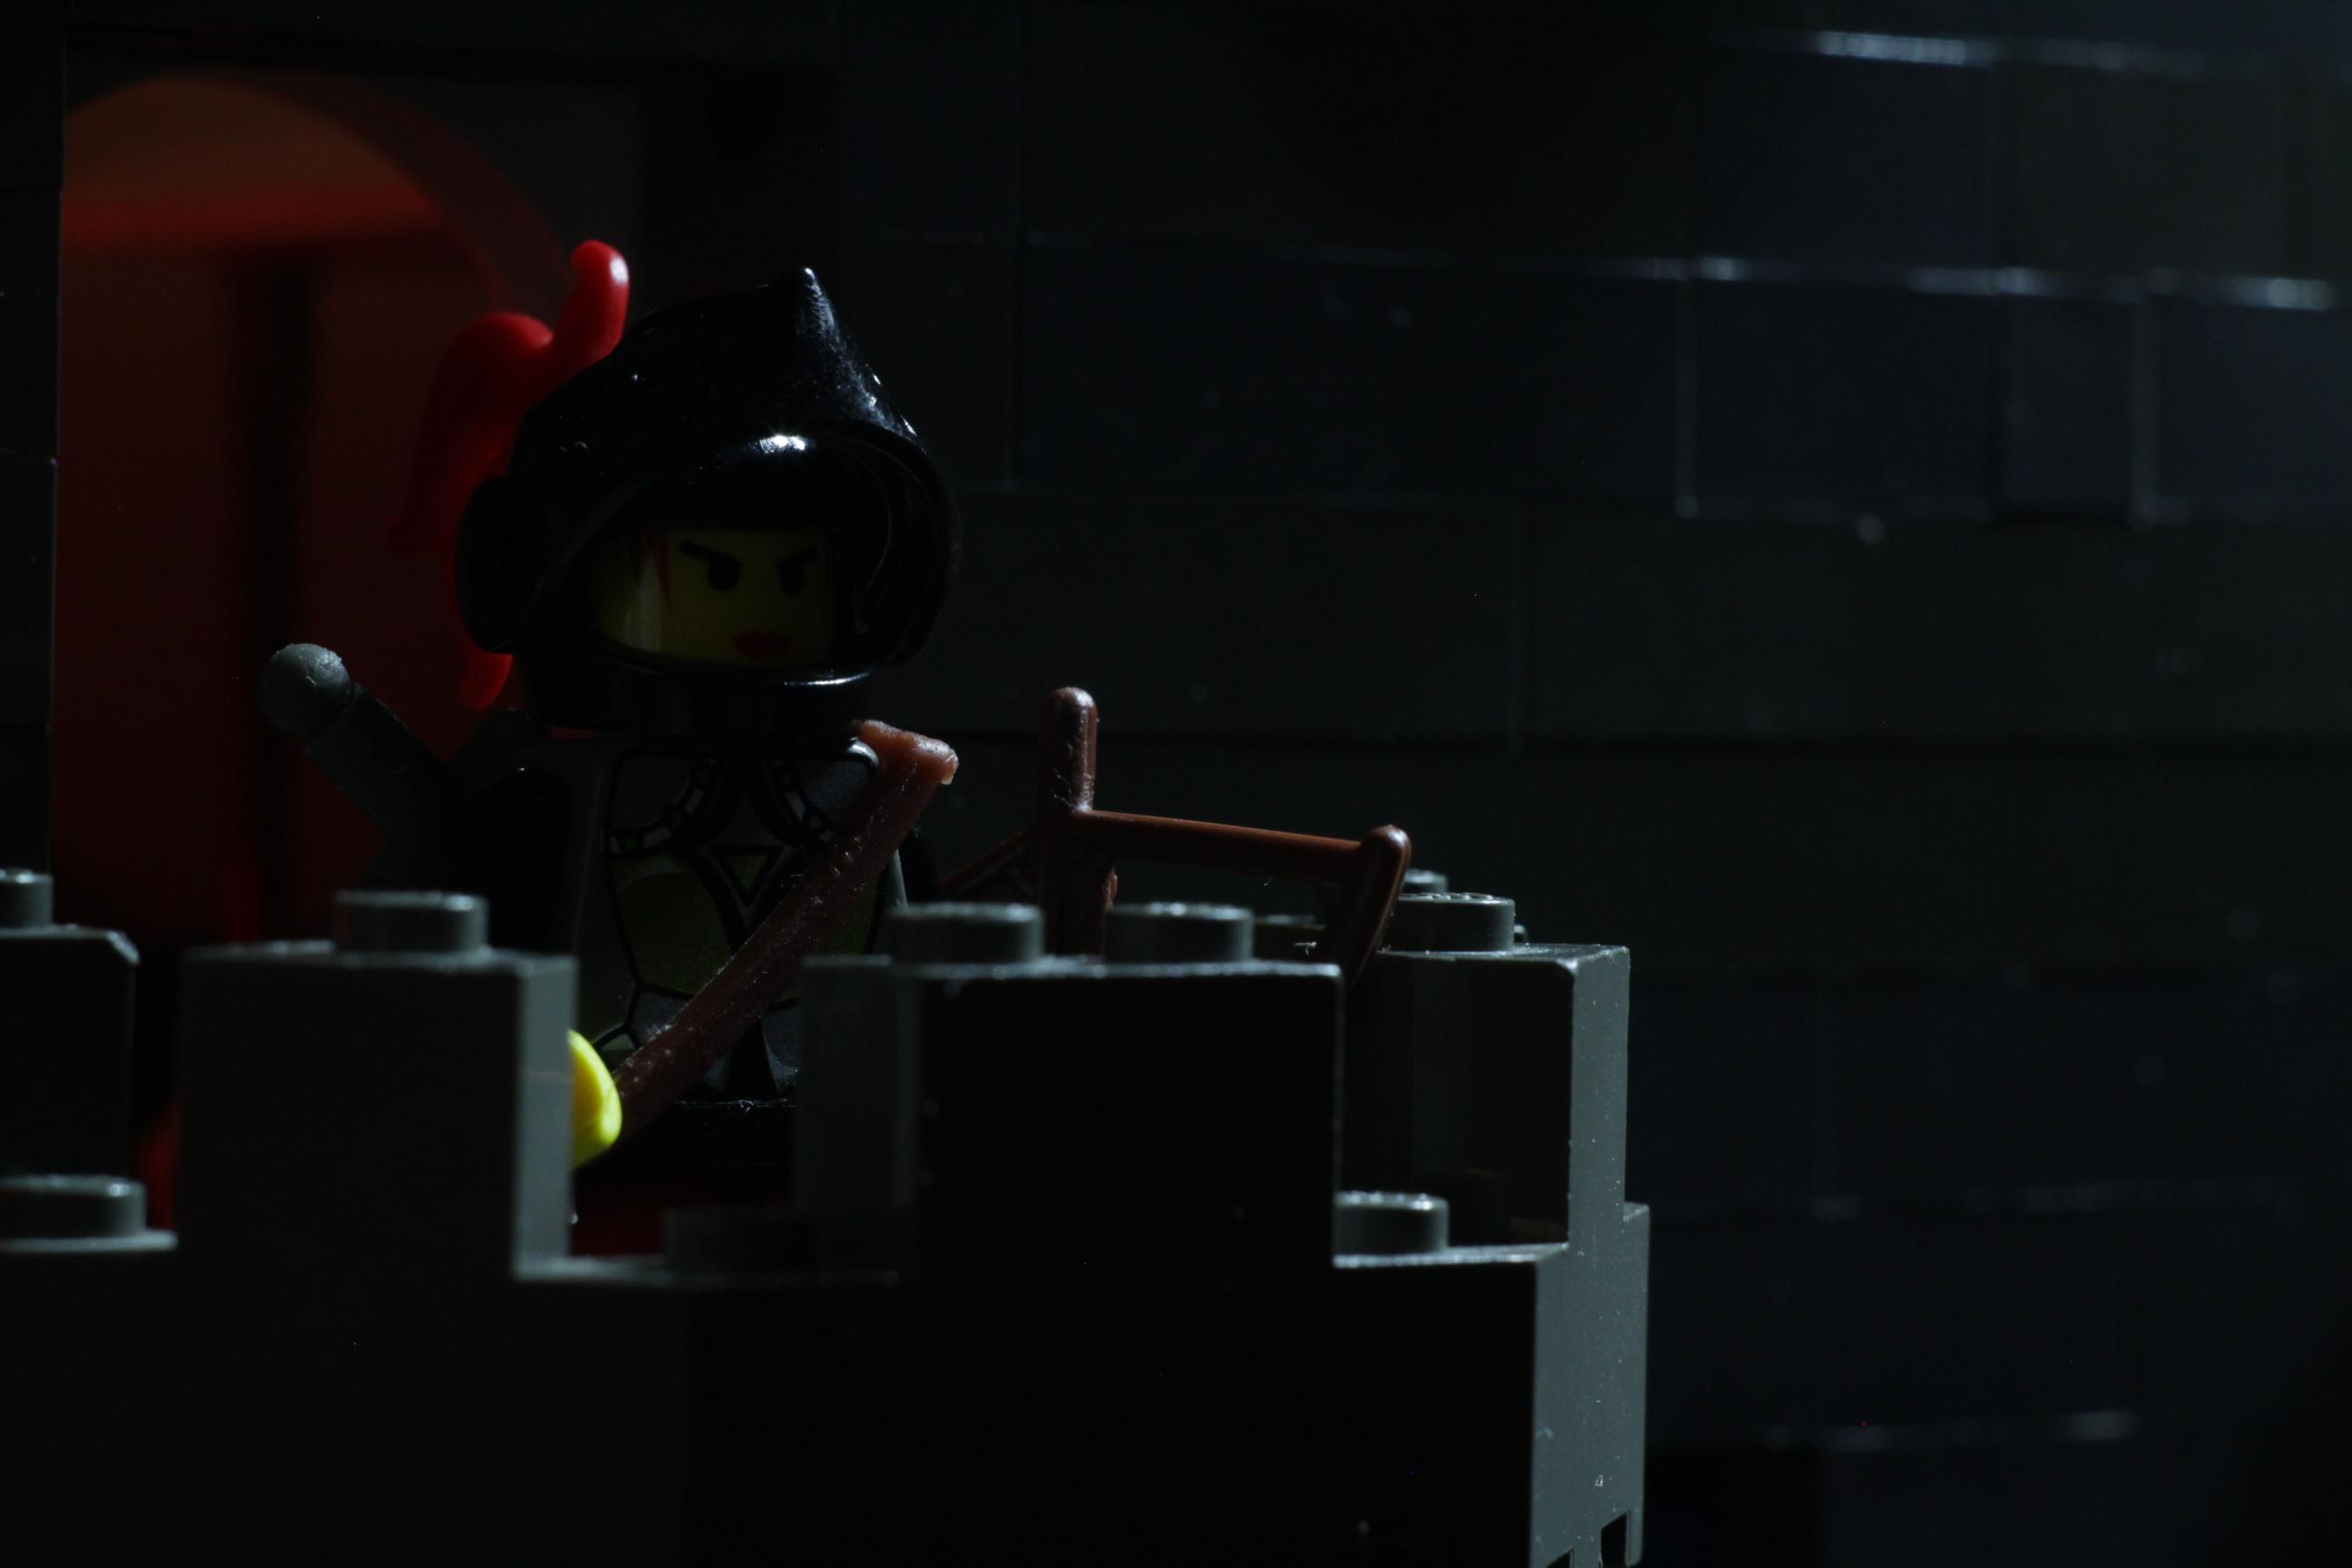 http://bricksafe.com/files/rioforce/Brickfilming/princess-storm/DSC_51318.jpg